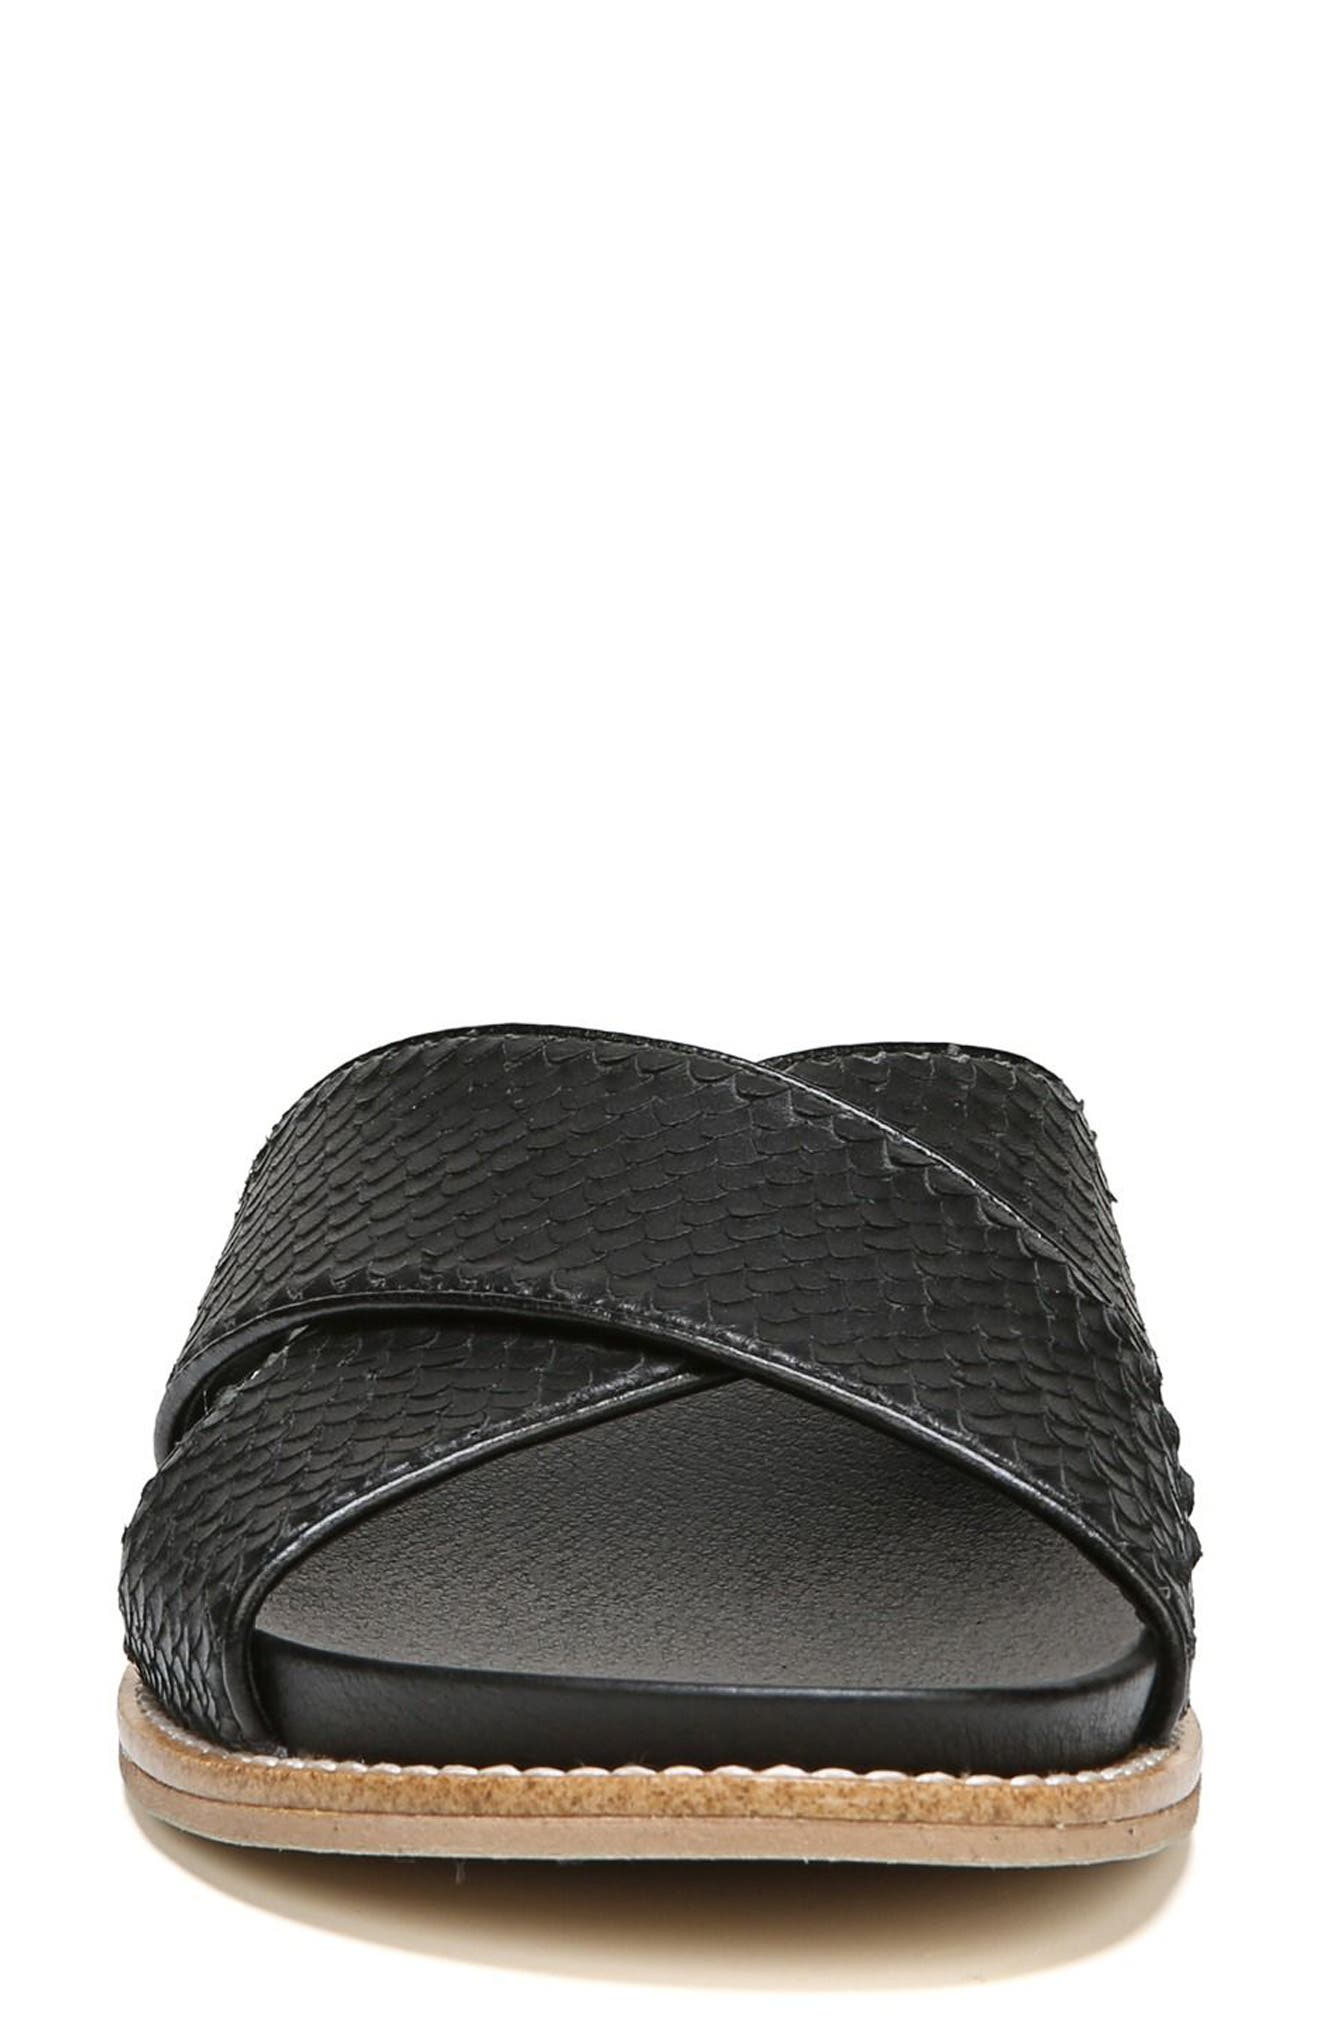 DR. SCHOLL'S, Deco Slide Sandal, Alternate thumbnail 4, color, BLACK LEATHER